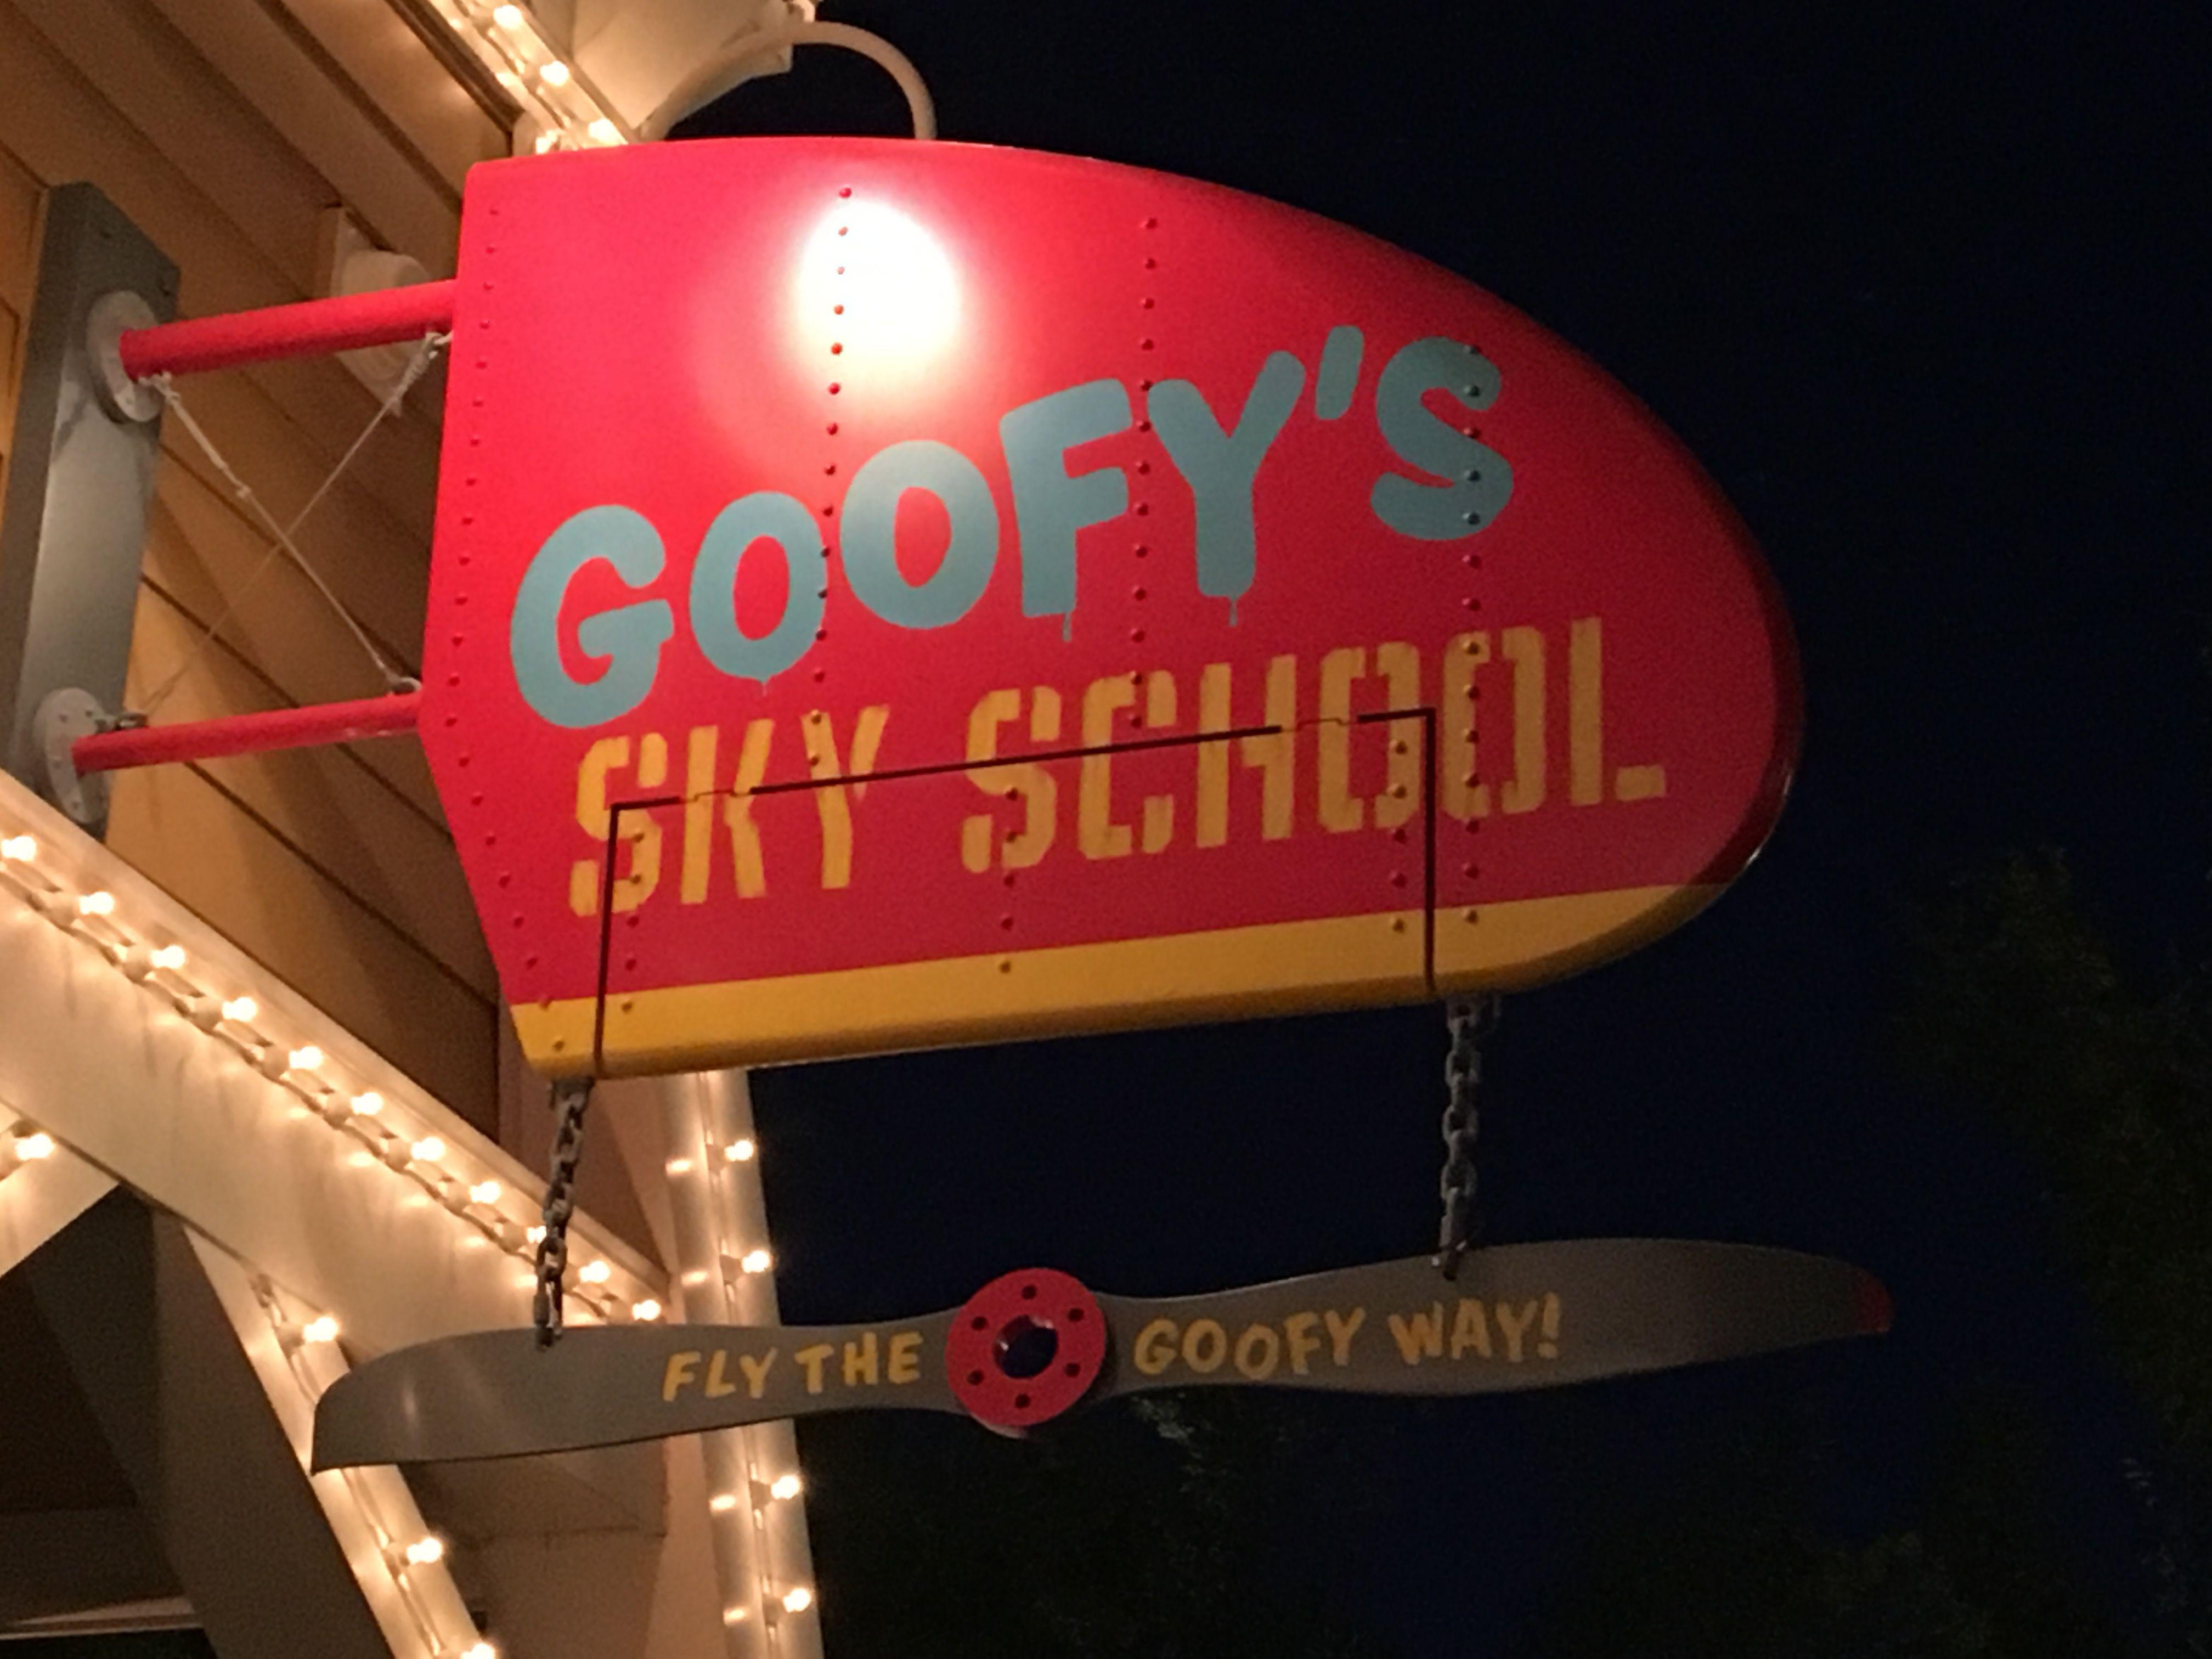 Goofy' Sky School